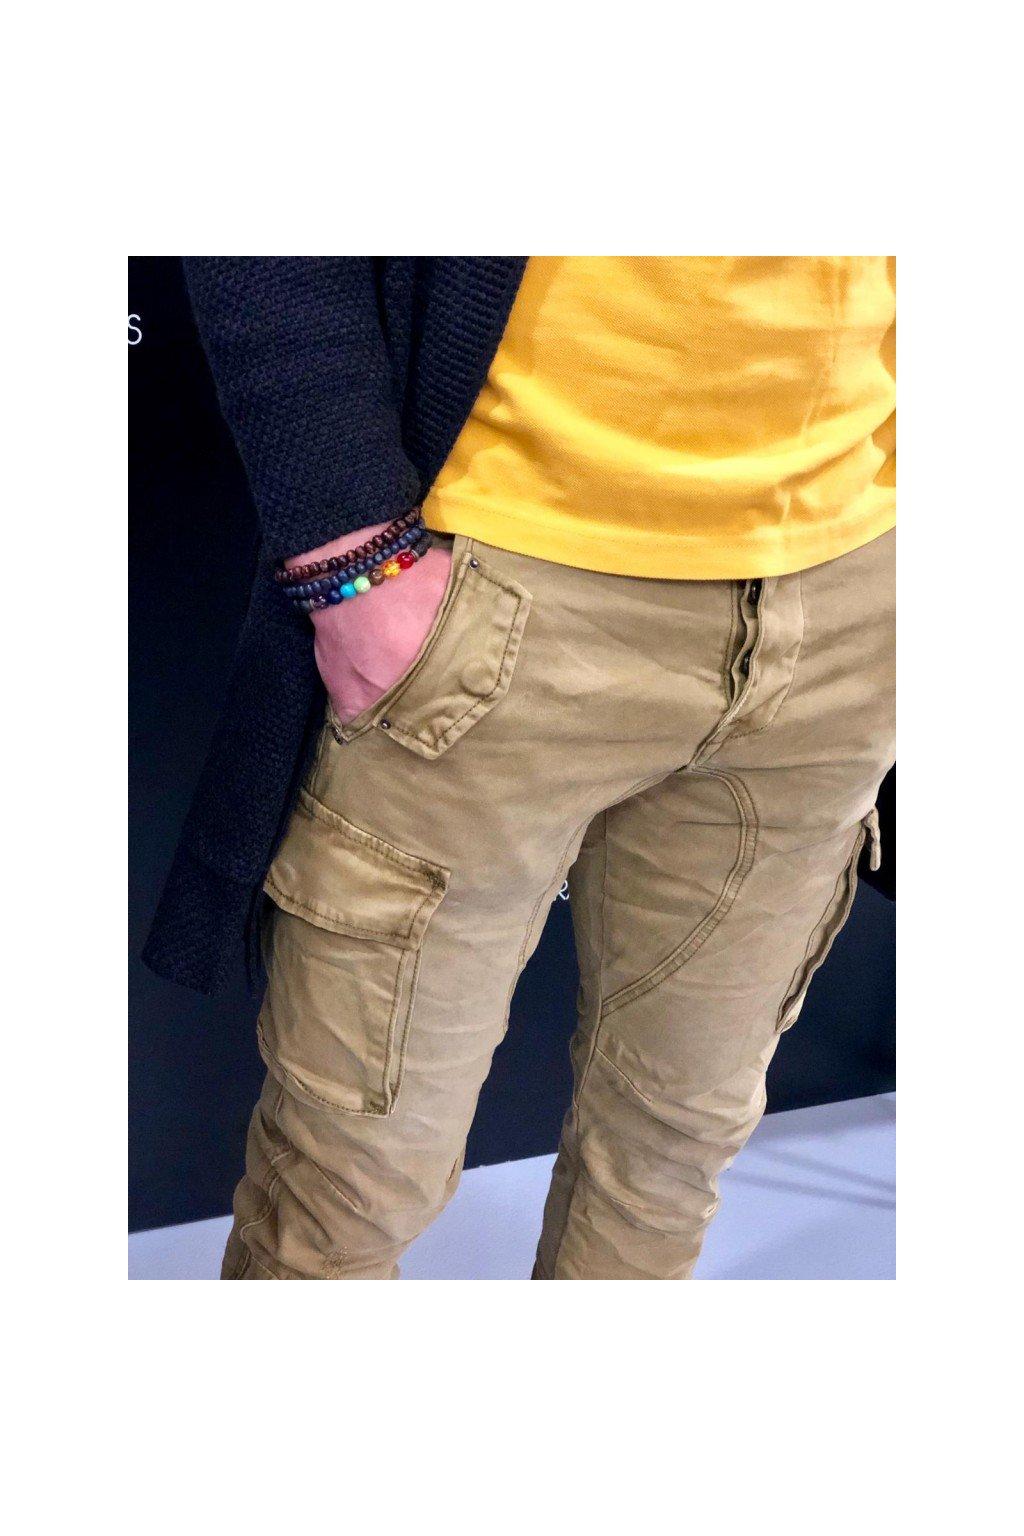 Kalhoty s kapsami GIANNI LUPO - barva KHAKI (Velikost Velikost 52)